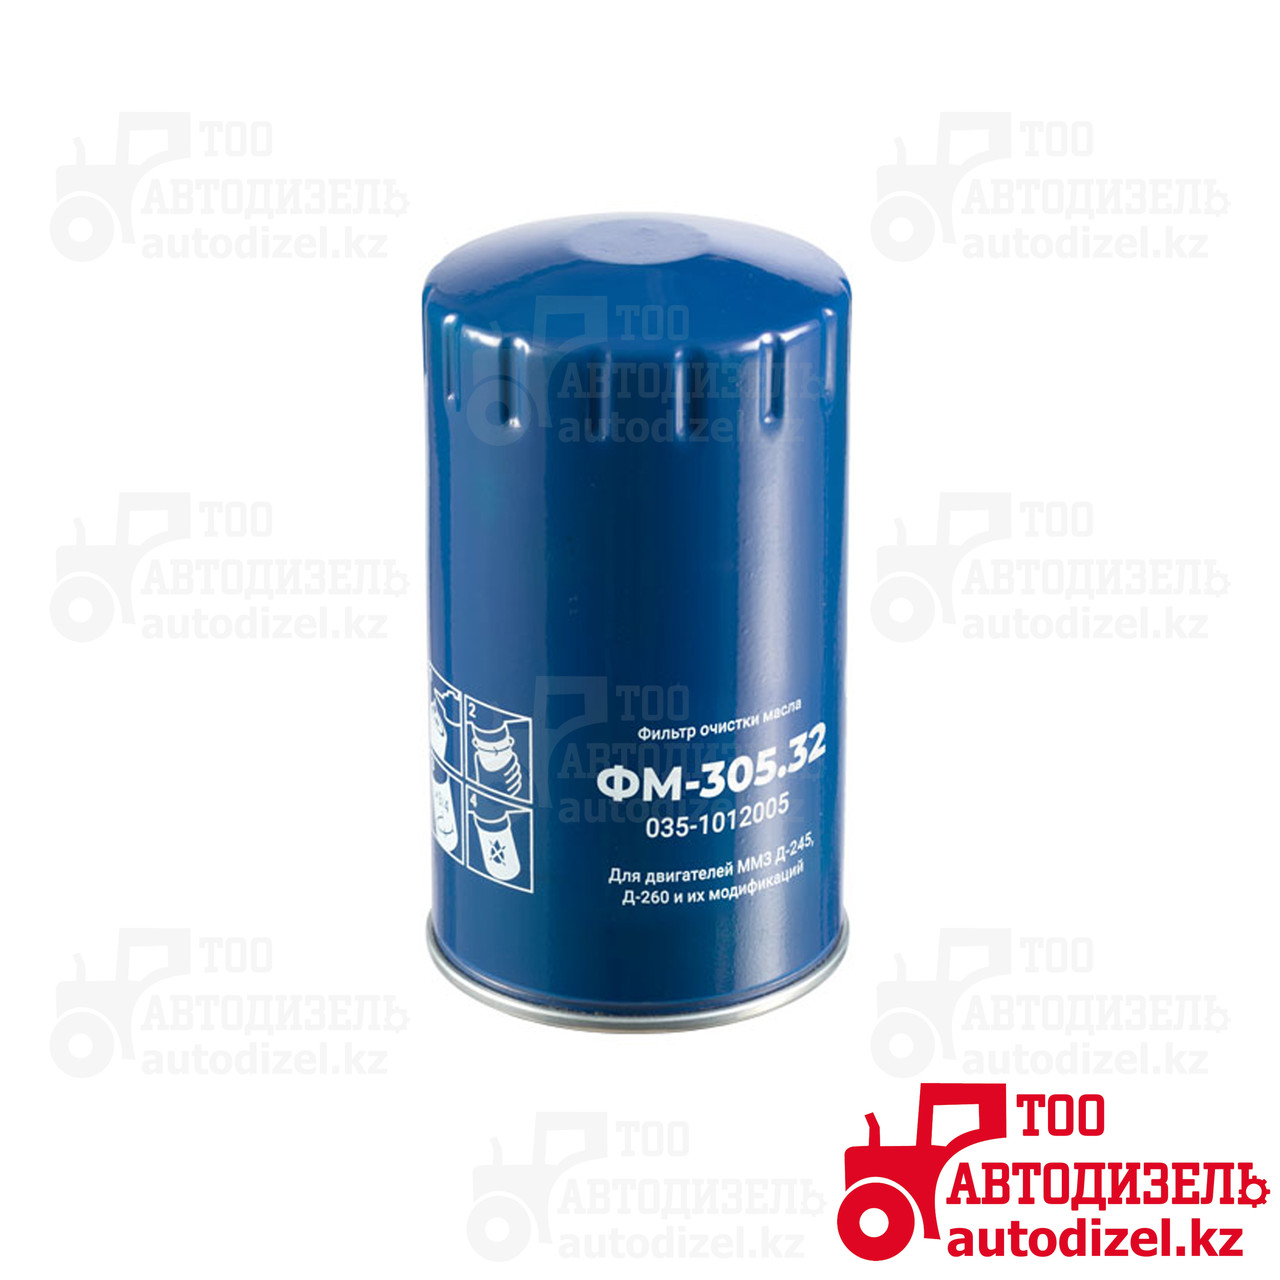 Фильтр очистки масла ММЗ Д-245 Д260 ФМ-305.32 (035-1012005)